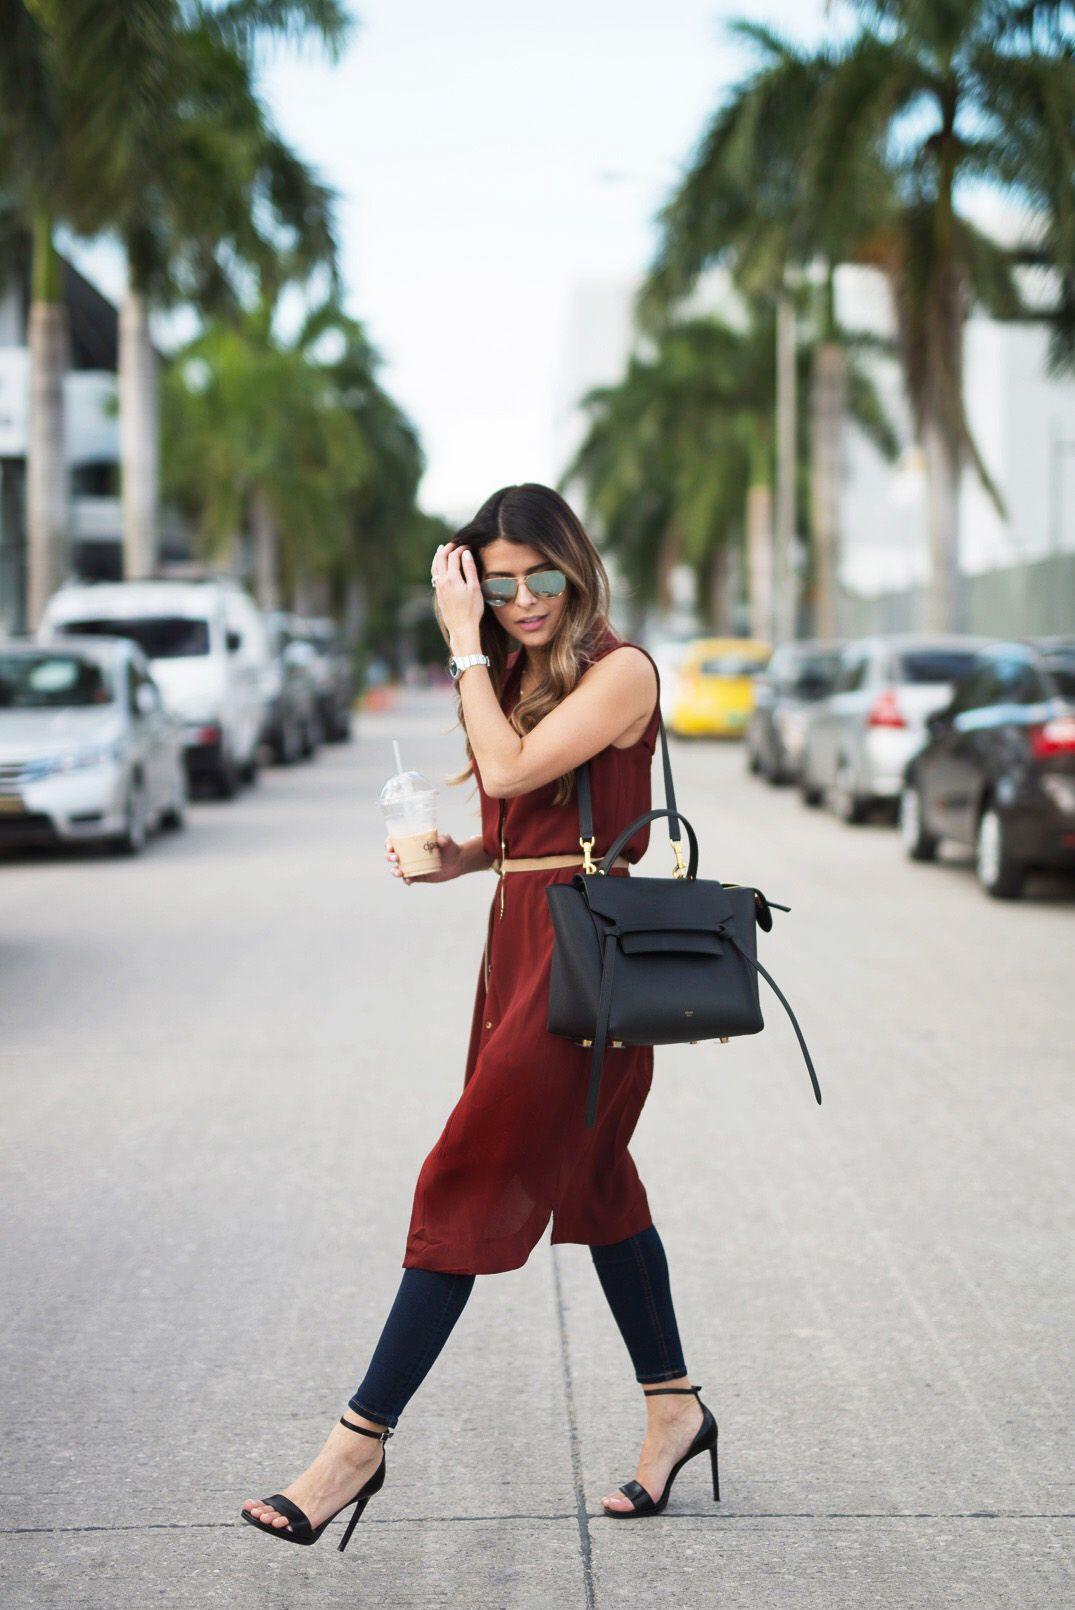 1bf44ca05f7 Pam Hetlinger, The Girl From Panama wearing a Mango Shirt Dress, Topshop  Jeans, Celine Belt Bag, and Saint Laurent Jane Sandals.